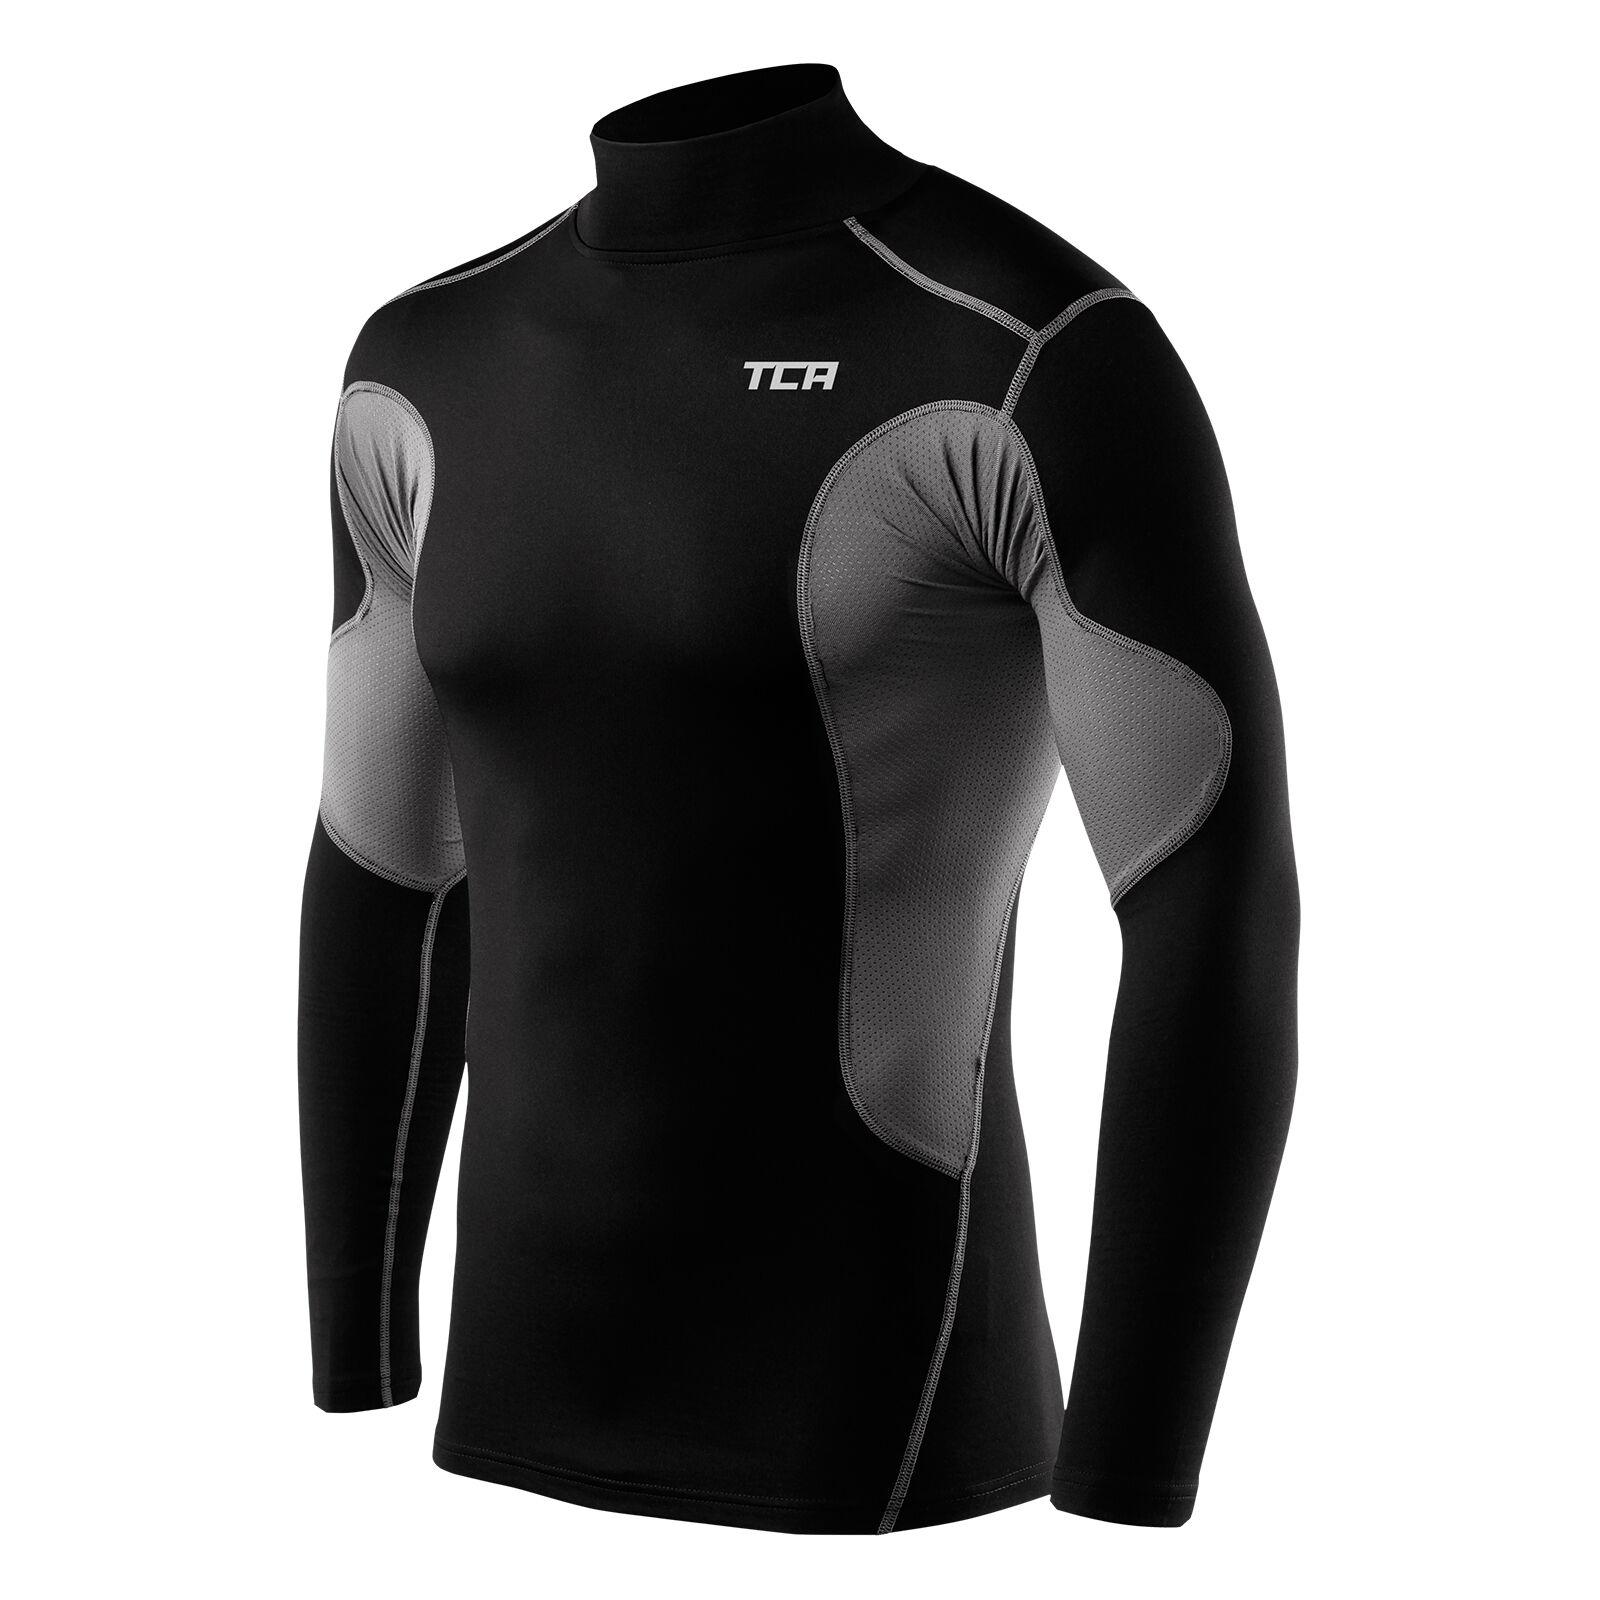 Mens TCA SuperThermal Compression Armour Base Layer Top Under Shirt Skins Reviews